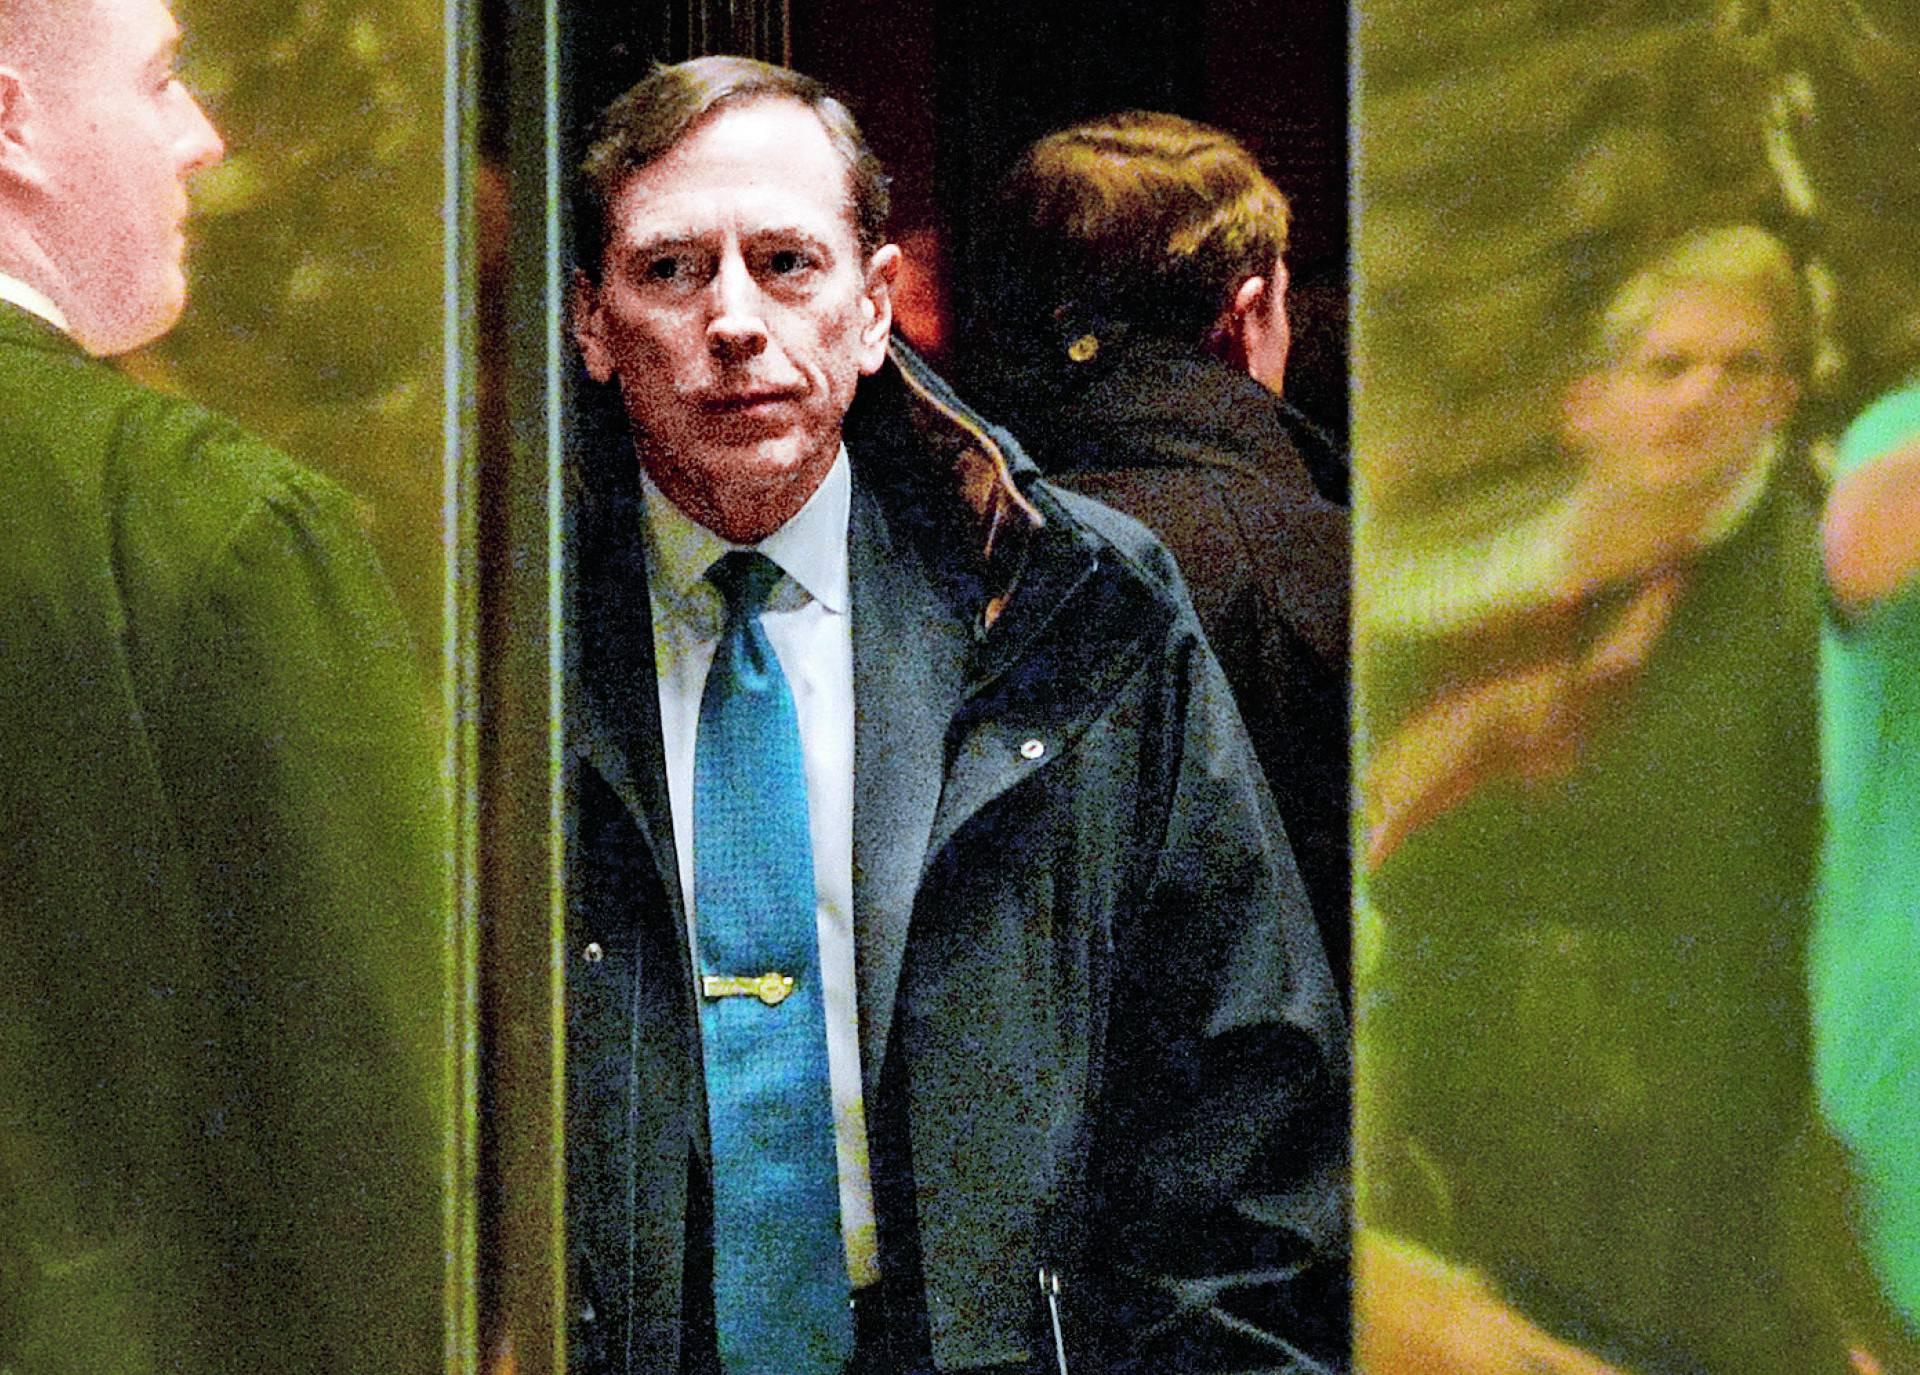 Sastanak u Banskim dvorima: Bivši šef CIA-e na tajnoj misiji